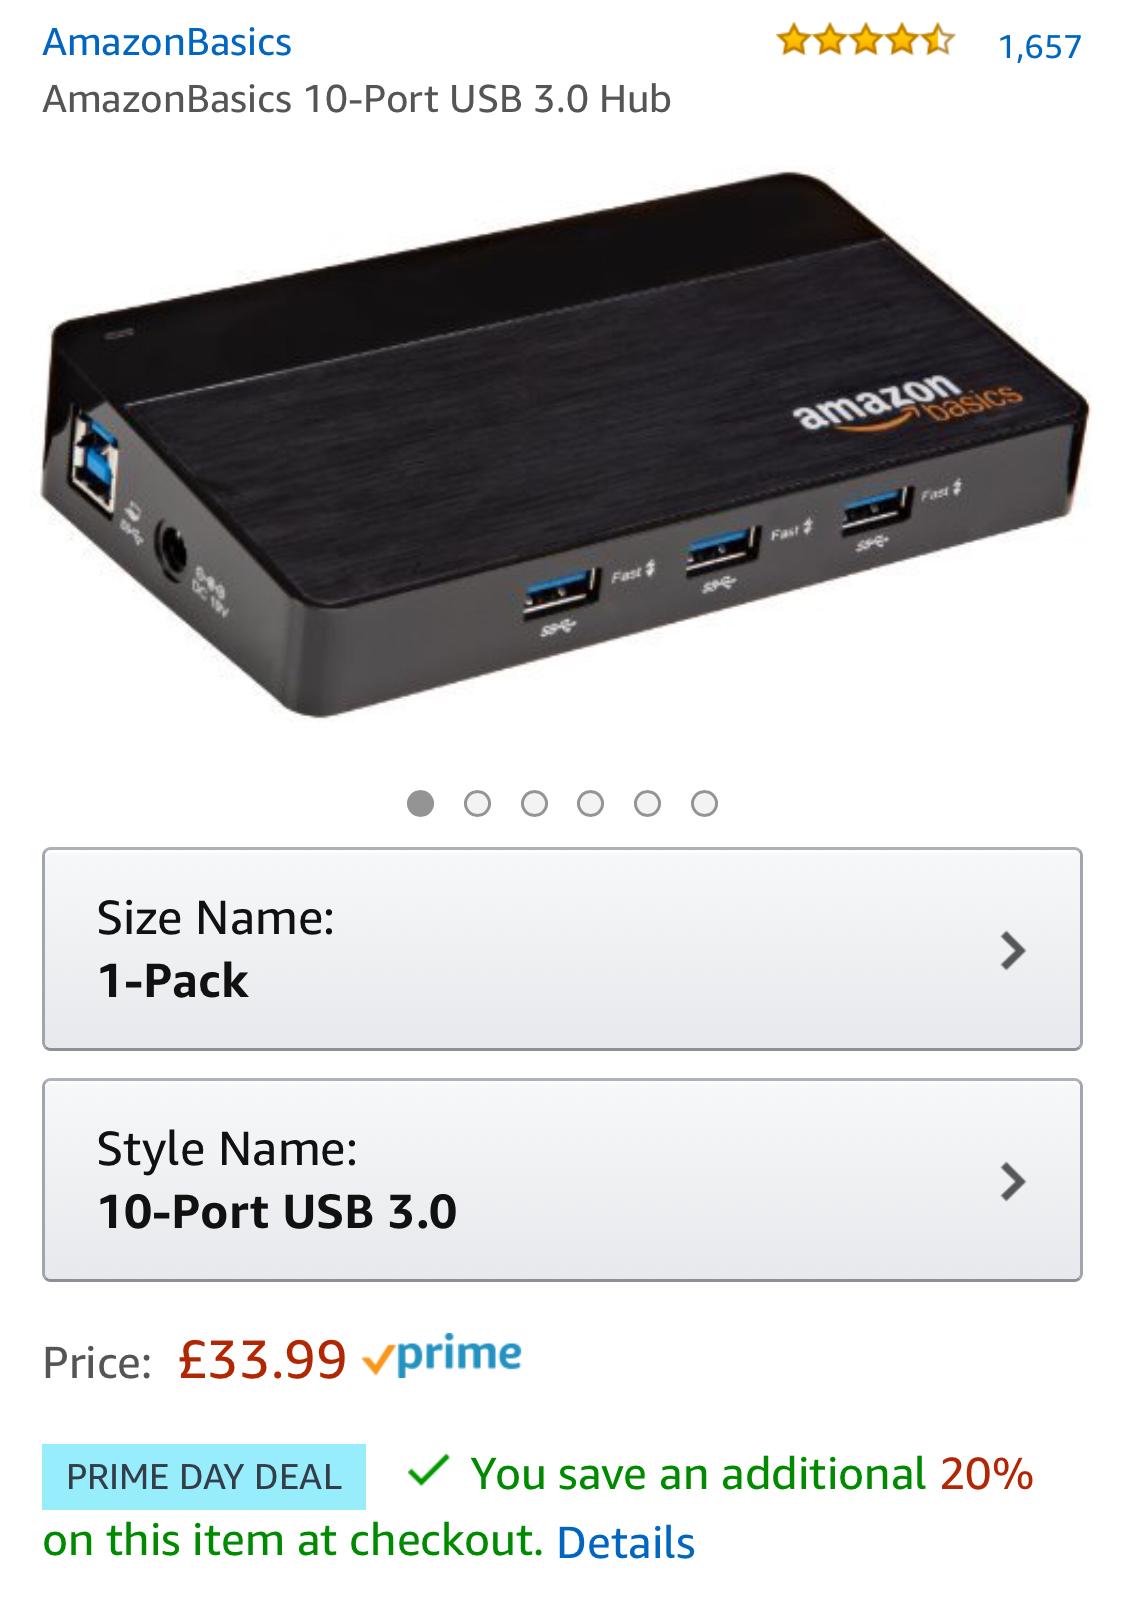 Amazon 10 port usb hub 3.0 £20.39 amazon prime day deal